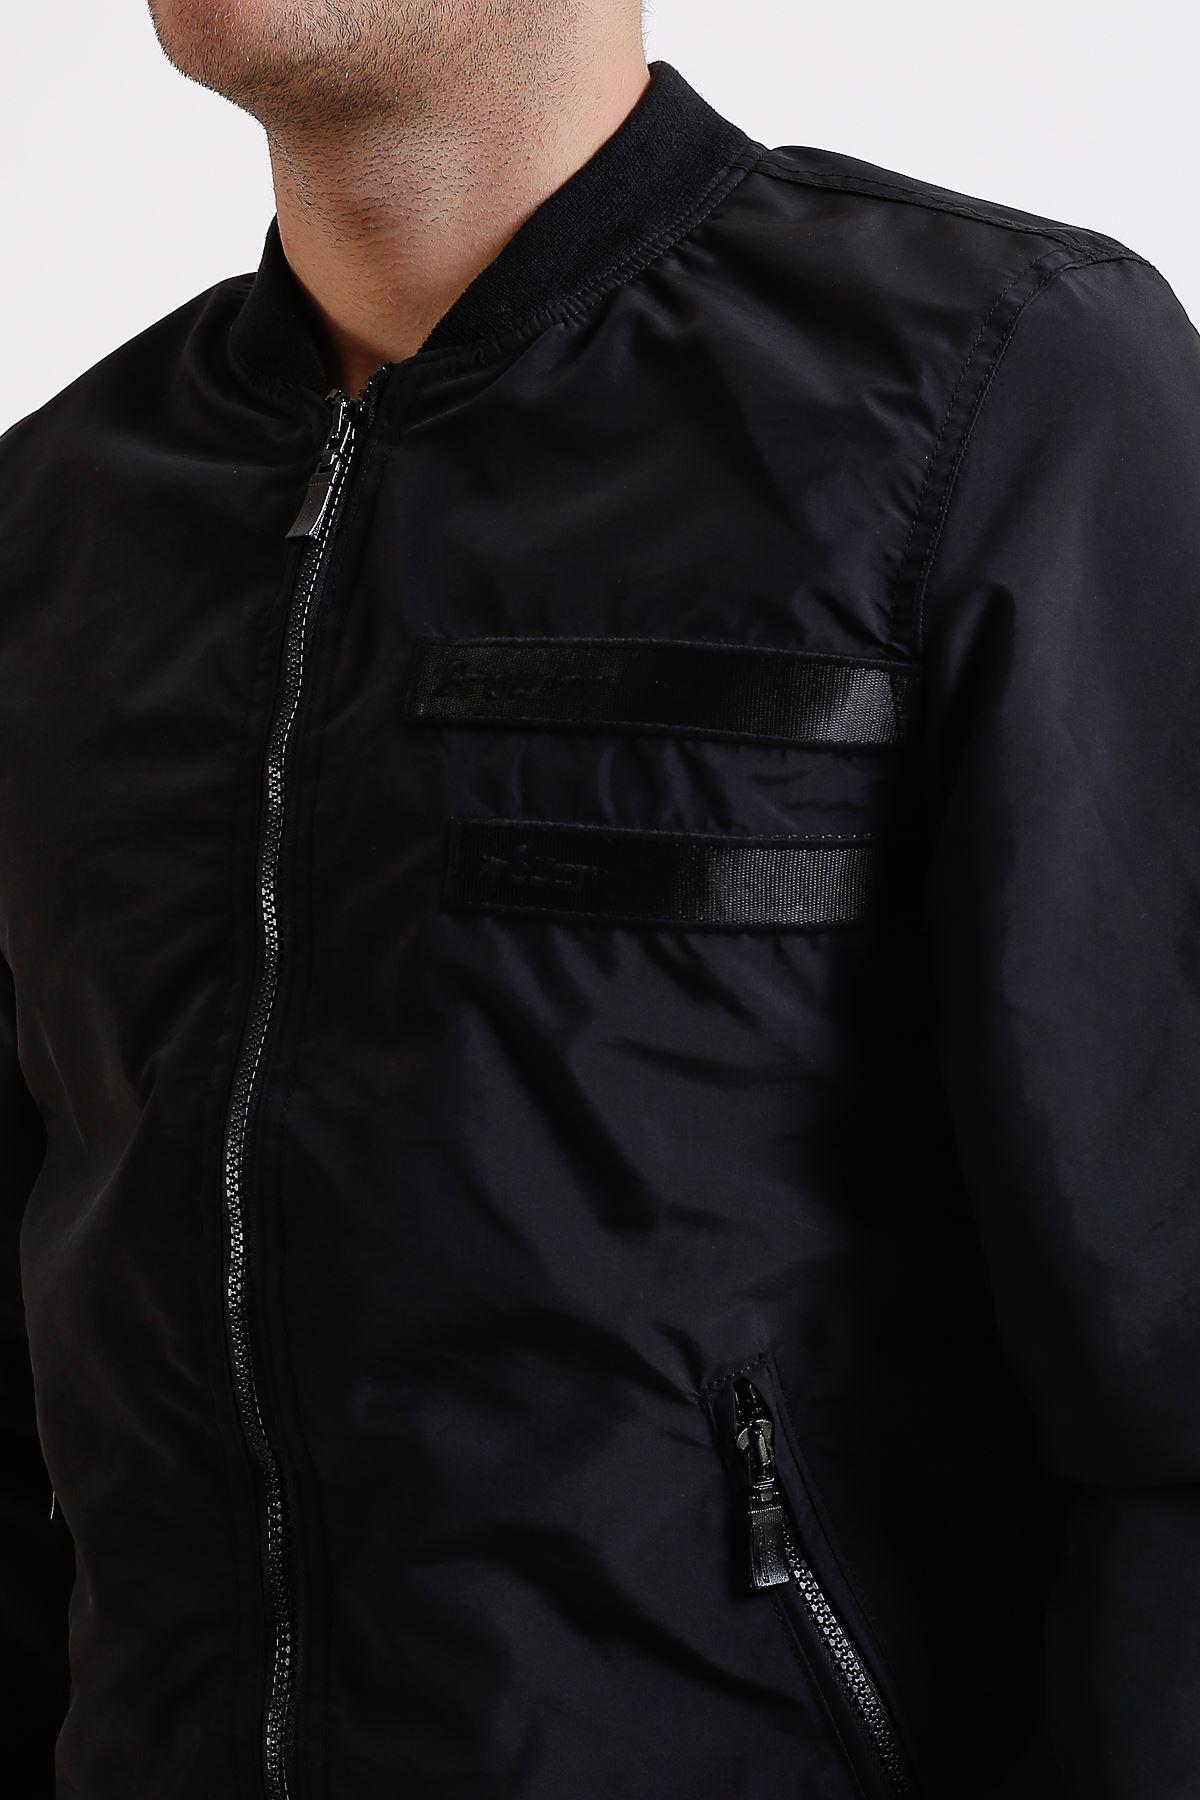 Erkek Hakim Yaka Fermuarlı Siyah İnce Yağmurluk Mont